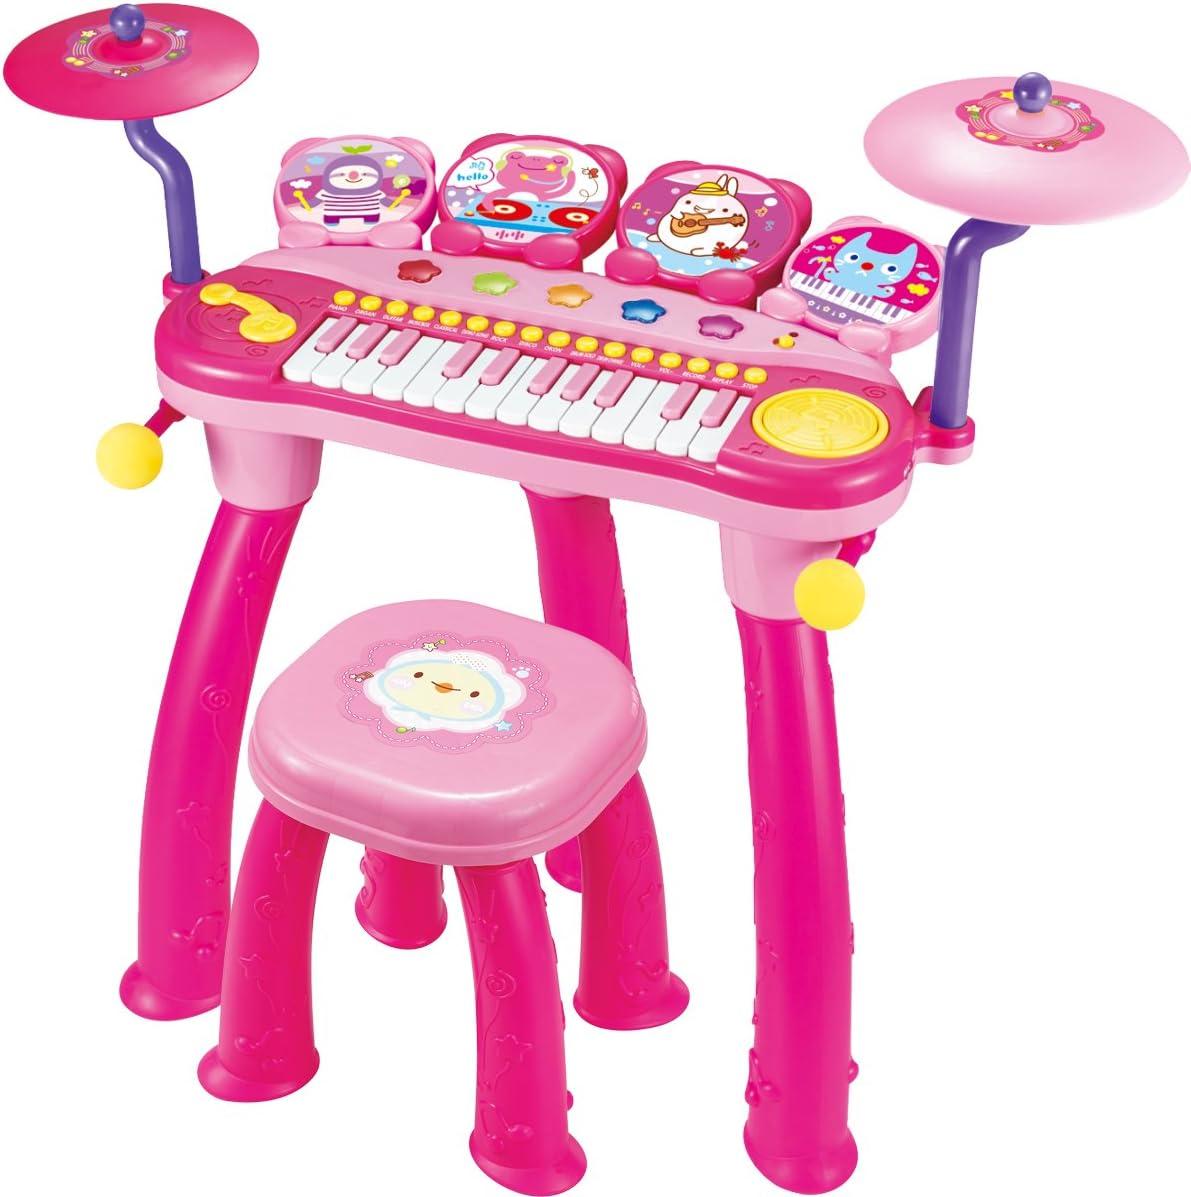 BAOLI 24 Keys DJ Popular shop is the lowest price challenge trend rank Piano Keyboard with Drum Combination Microphone